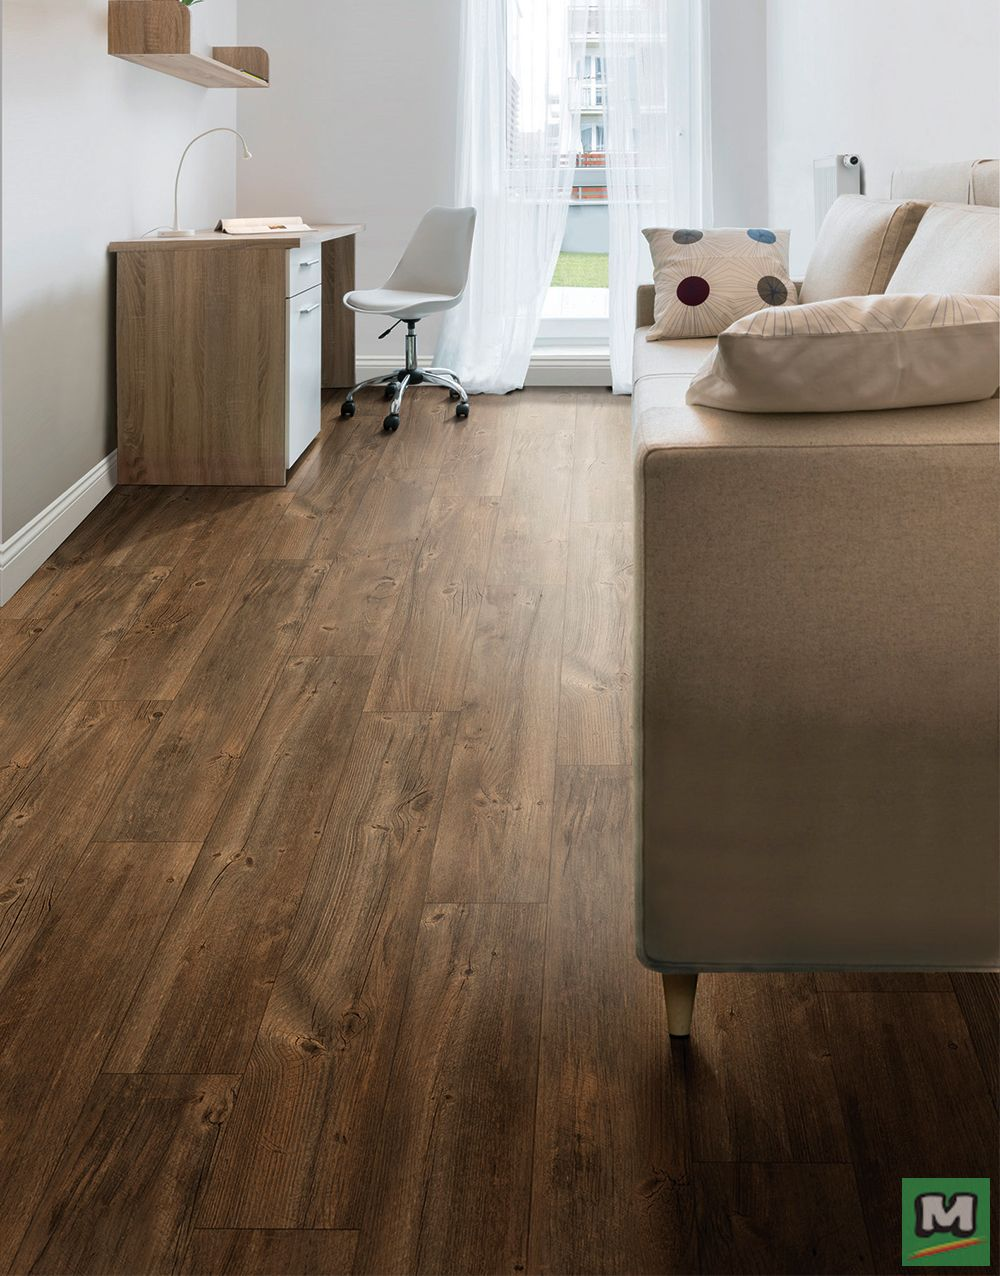 Tarkett® Bravado Oak Suede Laminate Flooring features